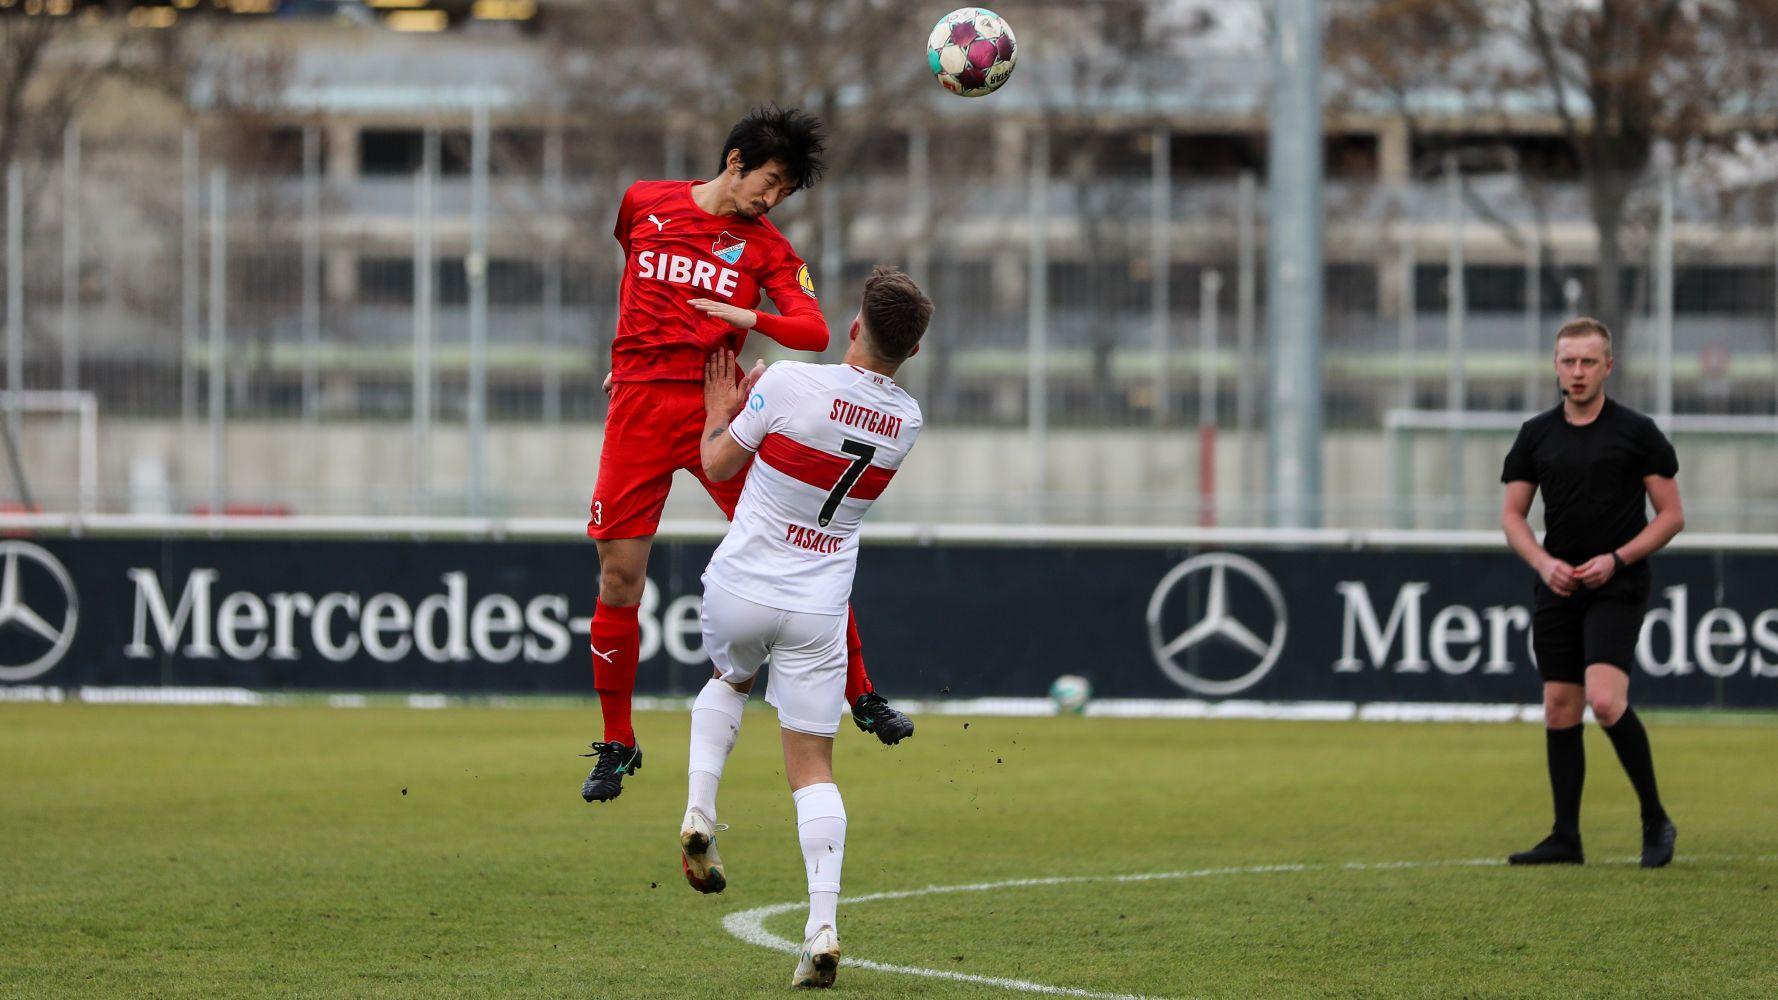 Ko Sawada TSV Steinbach Haiger VfB Stuttgart U21 Björn Franz